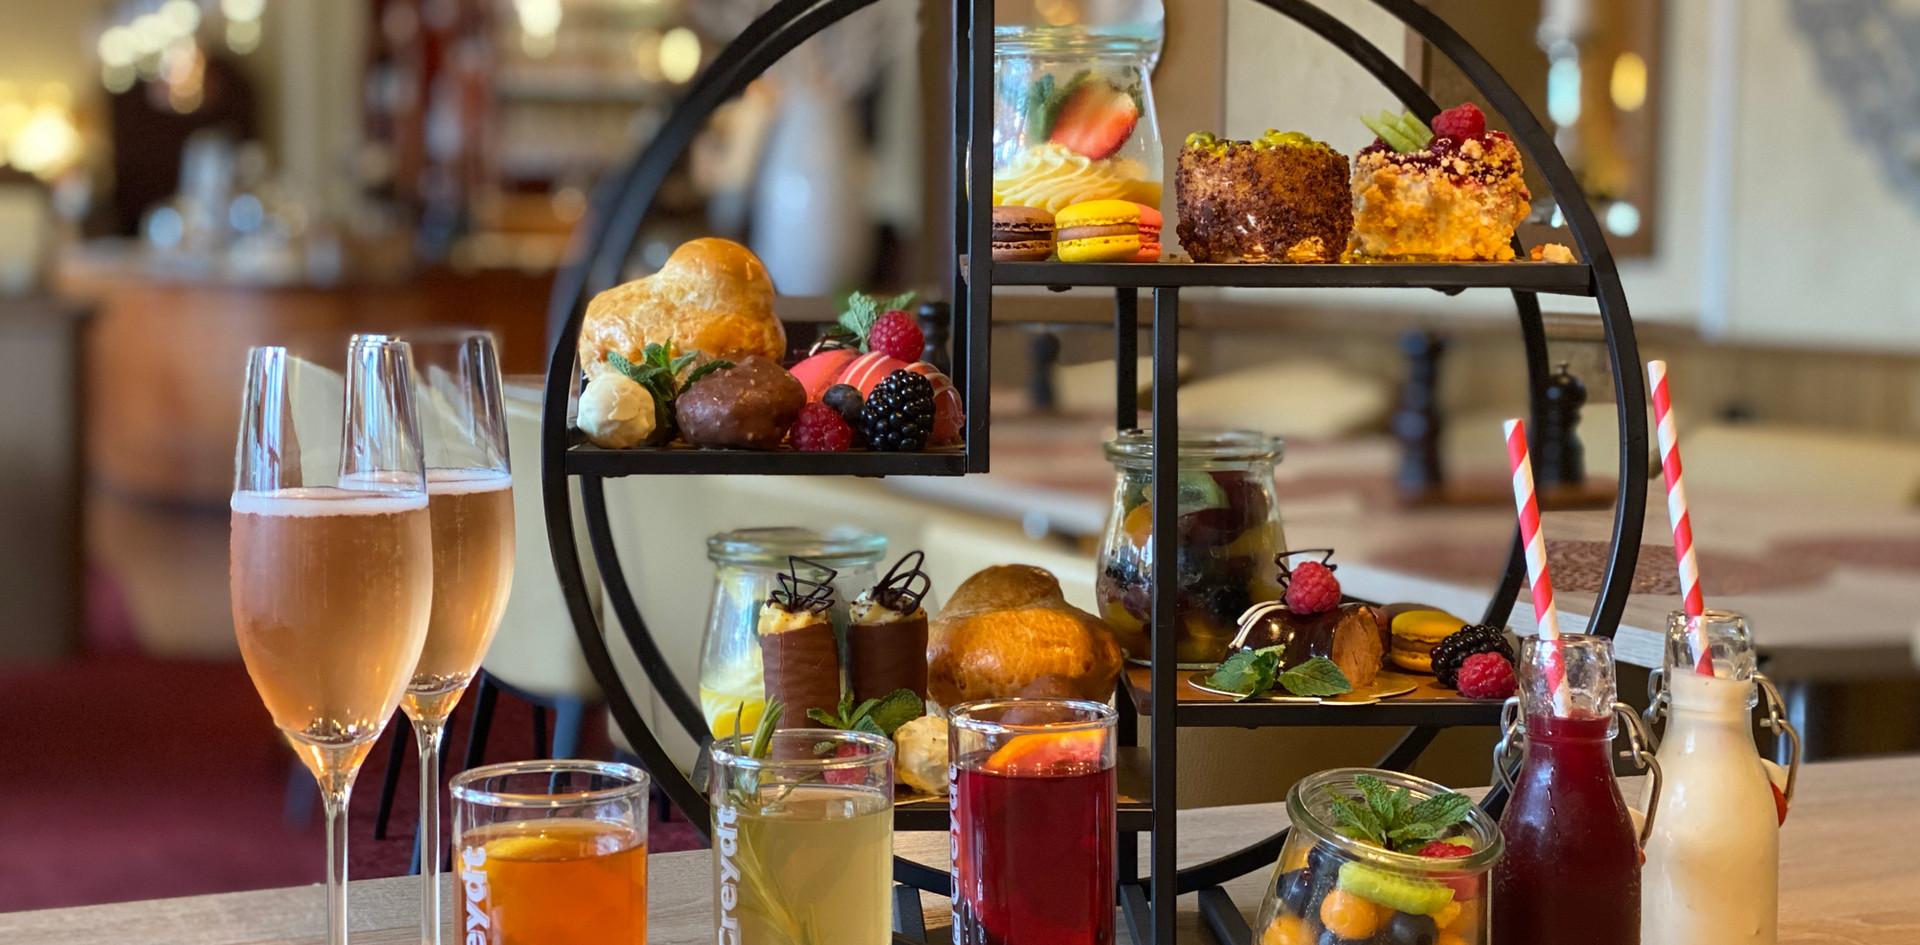 Sekt im Afternoon Tea - Hotel Wegner - The culinary Art Hotel